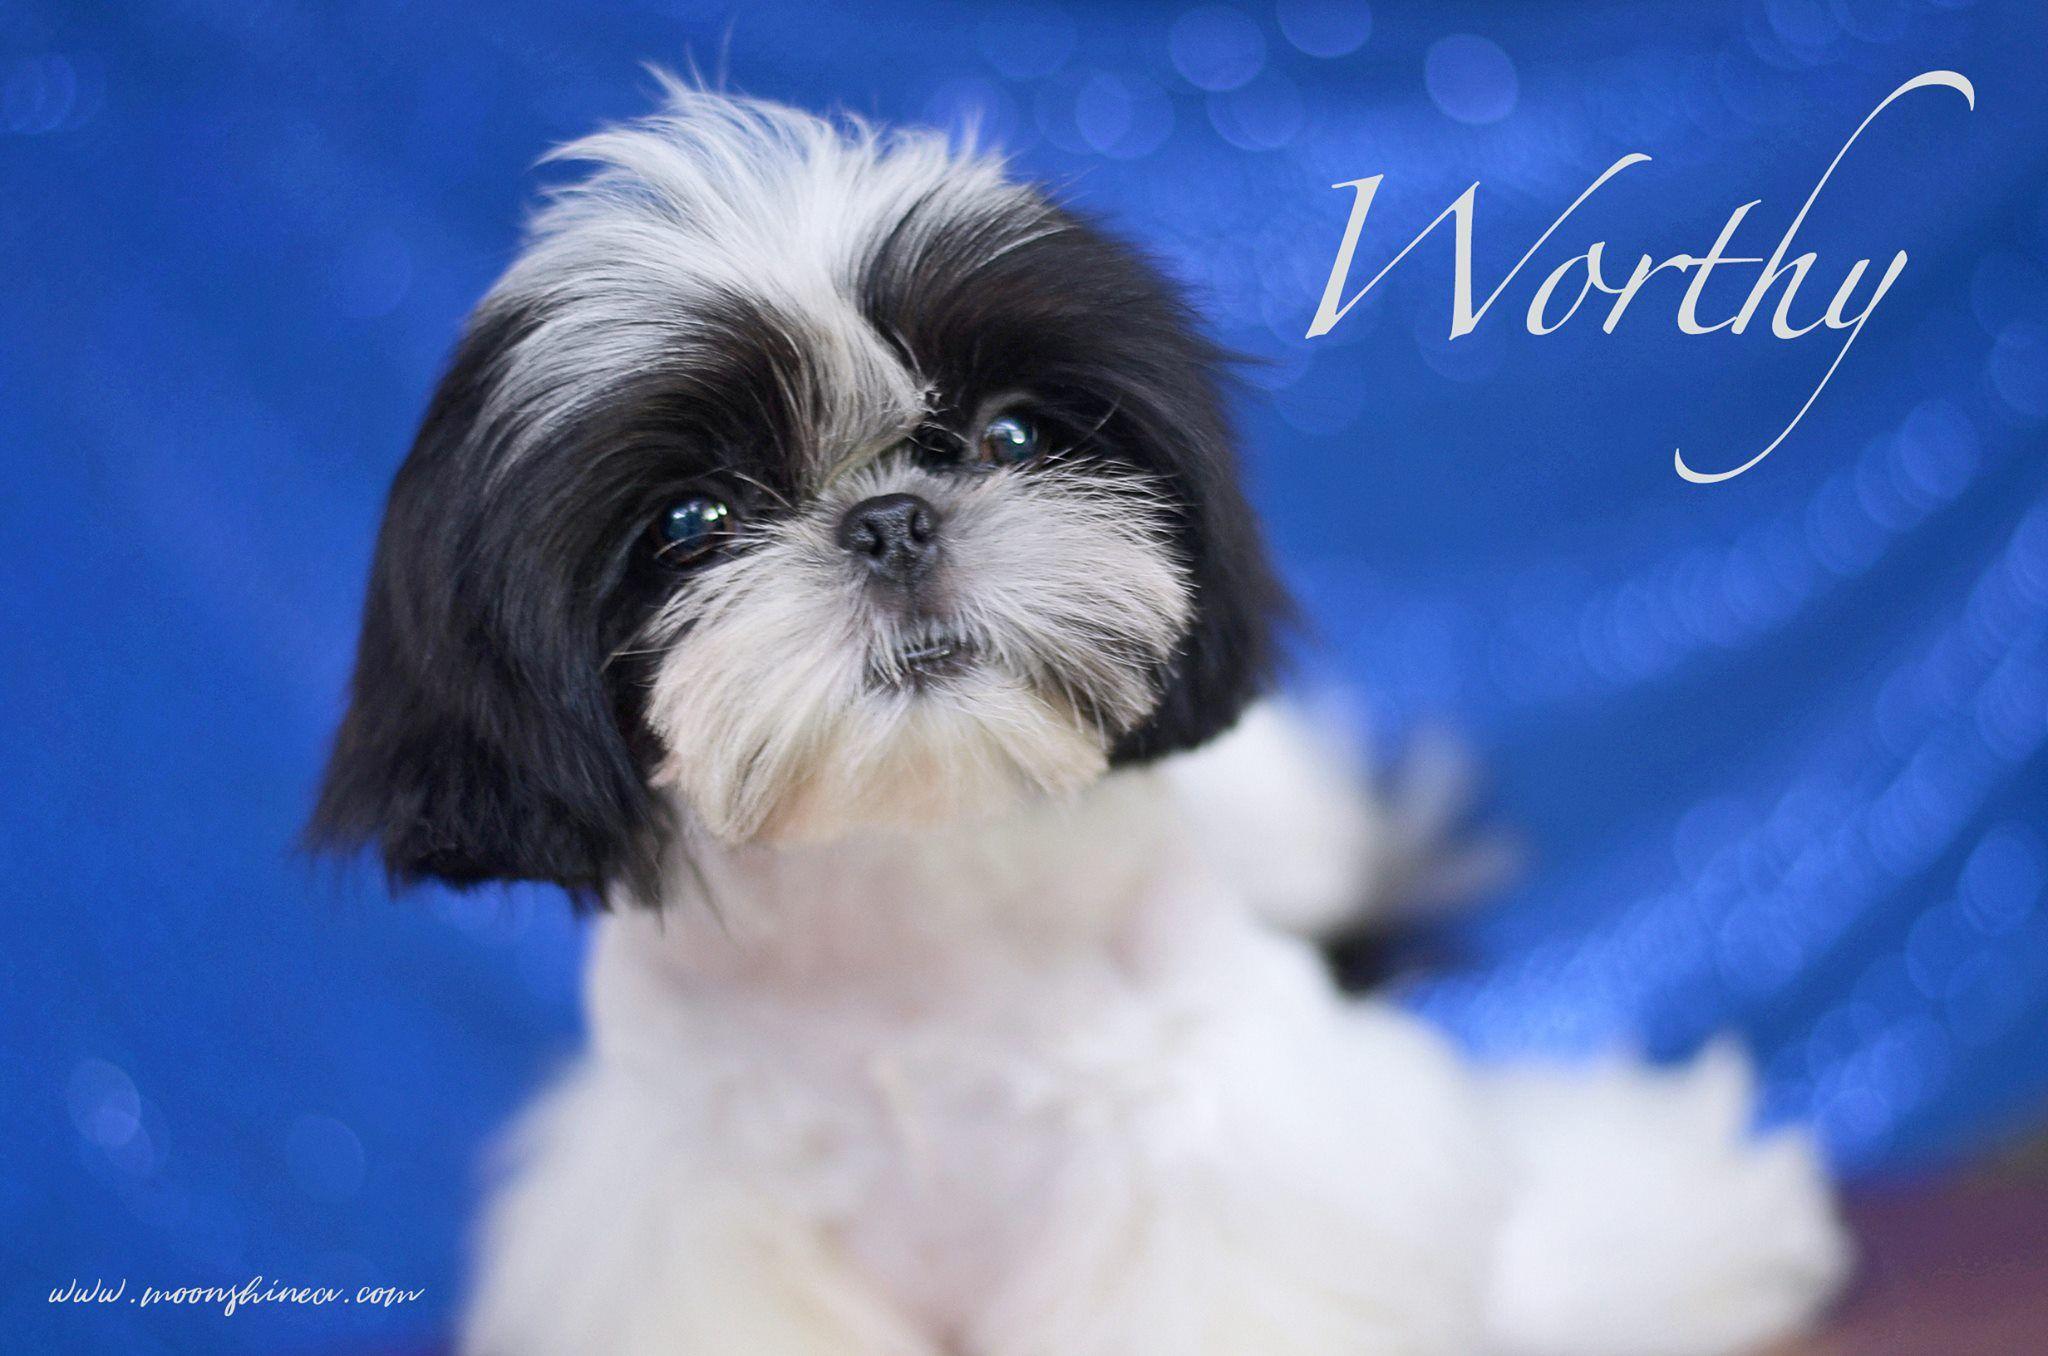 Beautiful Black And White Shih Tzu Puppy Philippines Shih Tzu Puppy Shih Tzu Shih Tzus